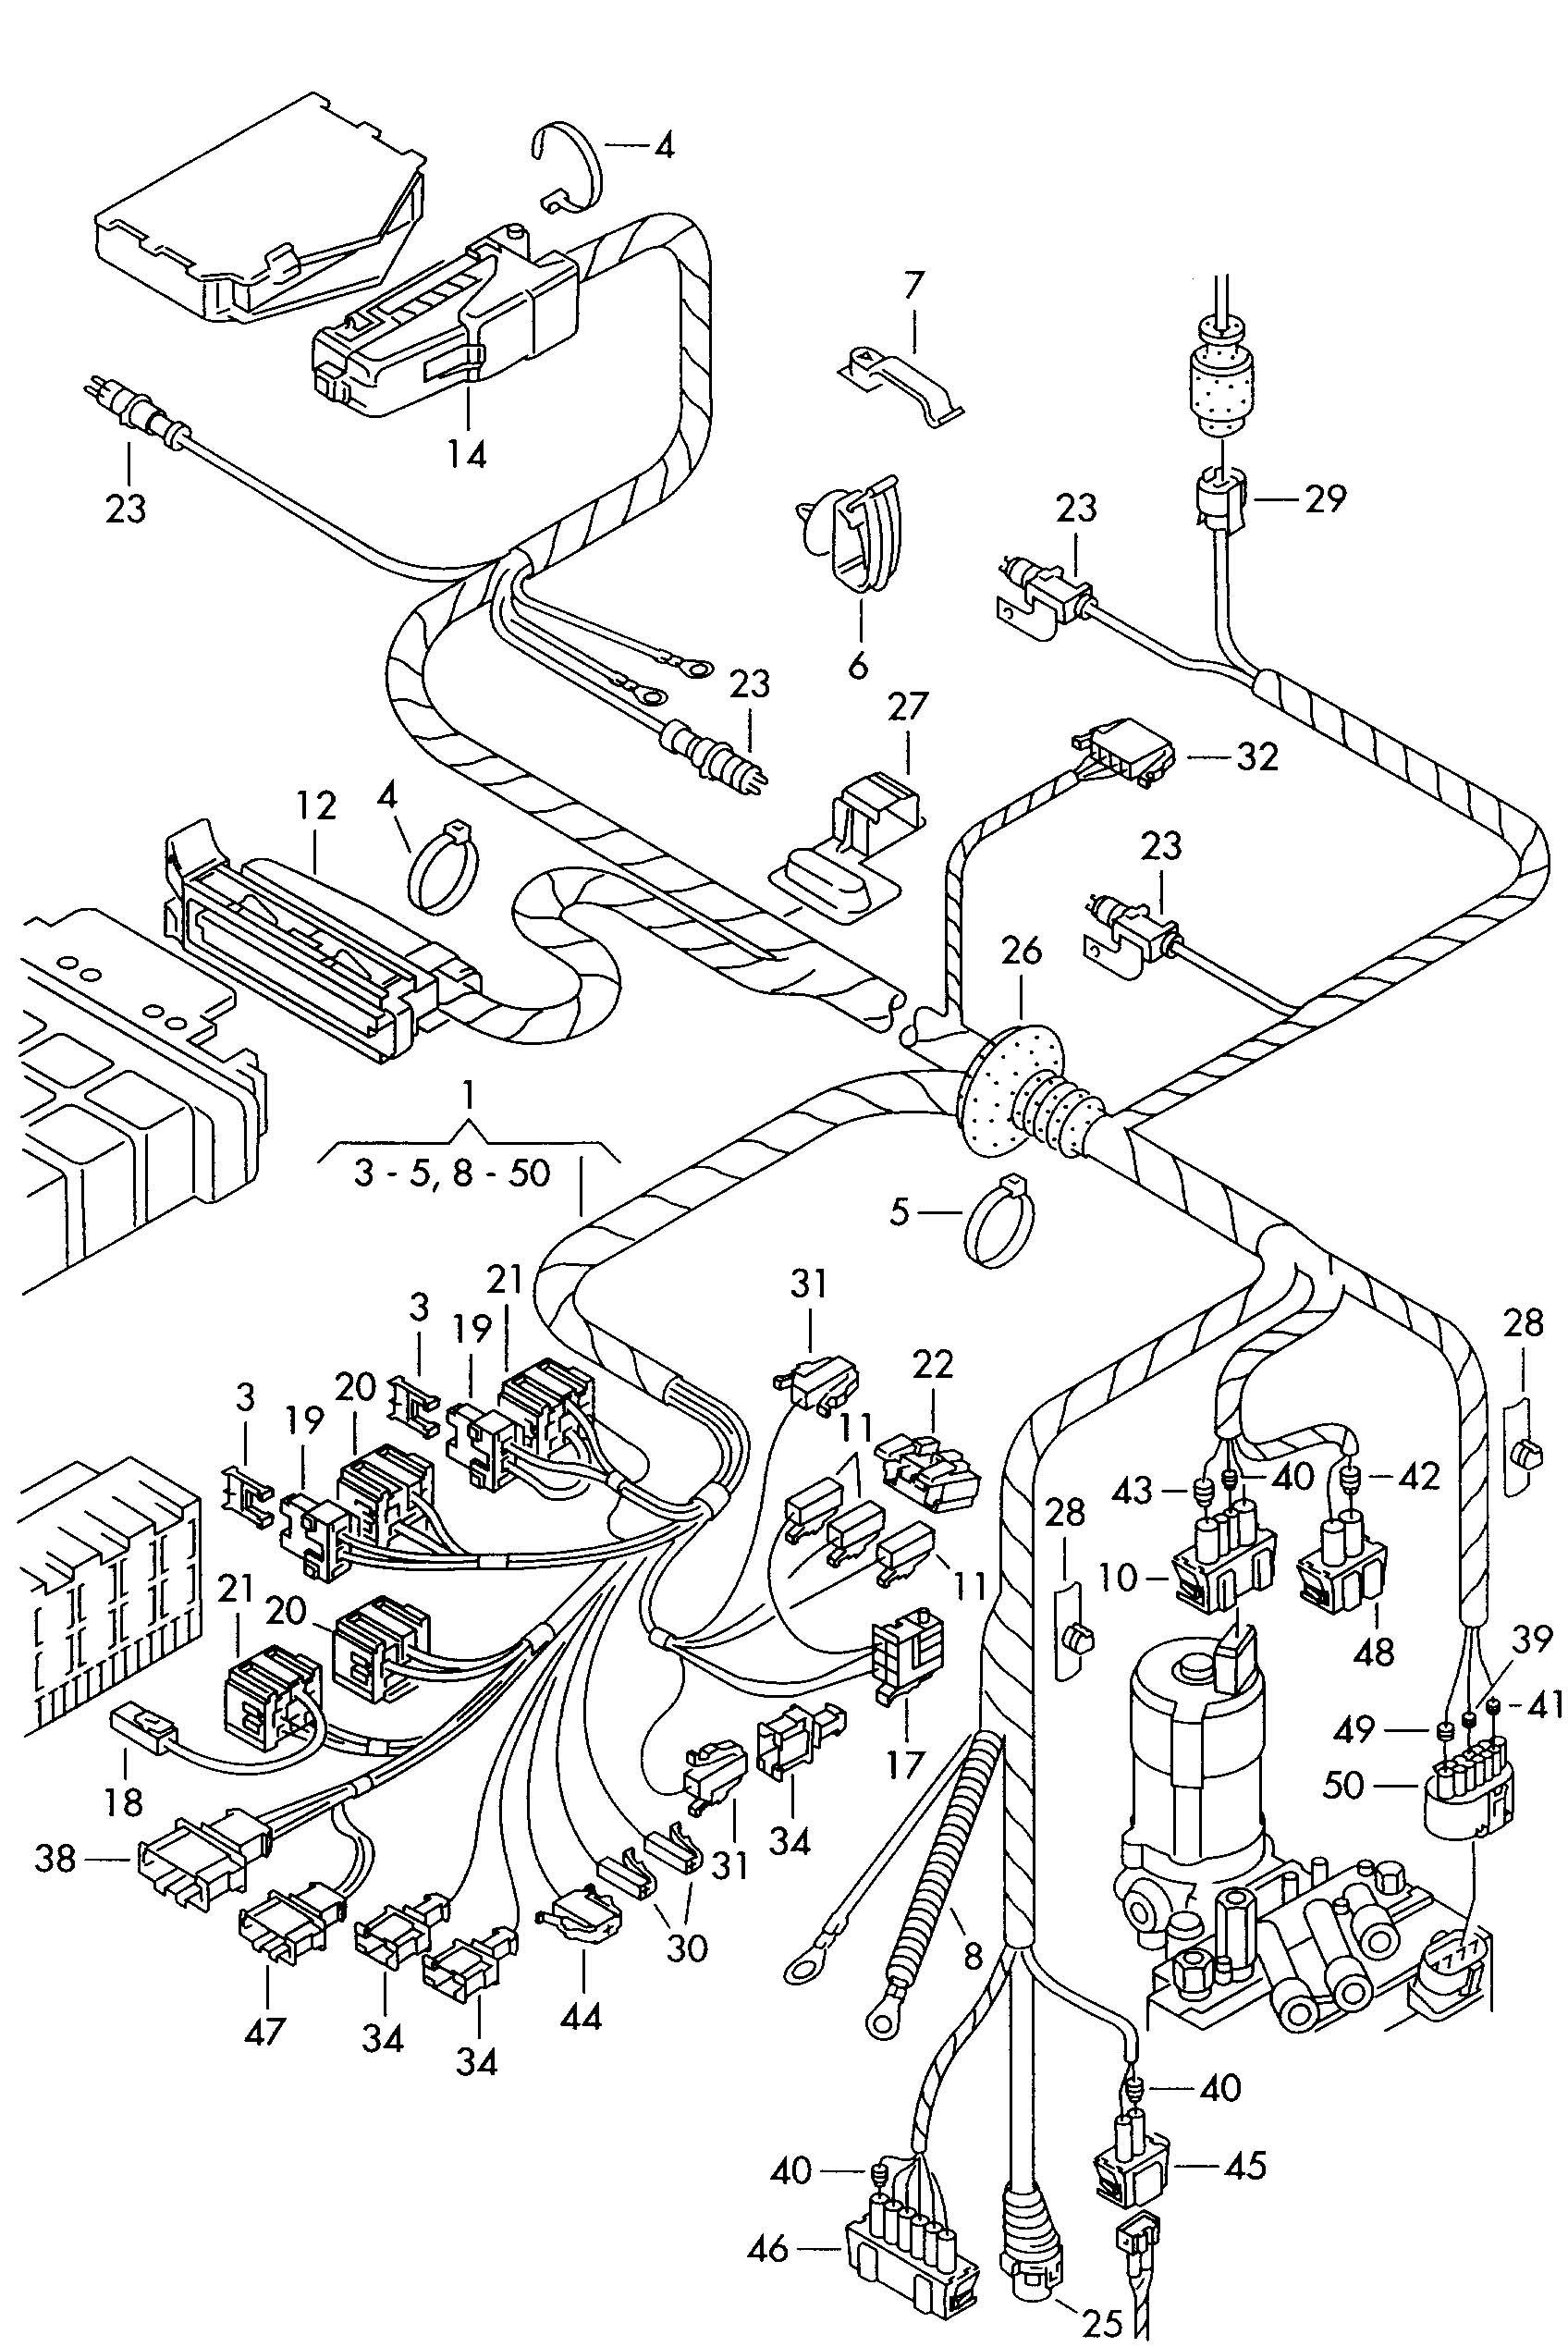 2.5 land rover engine diagram